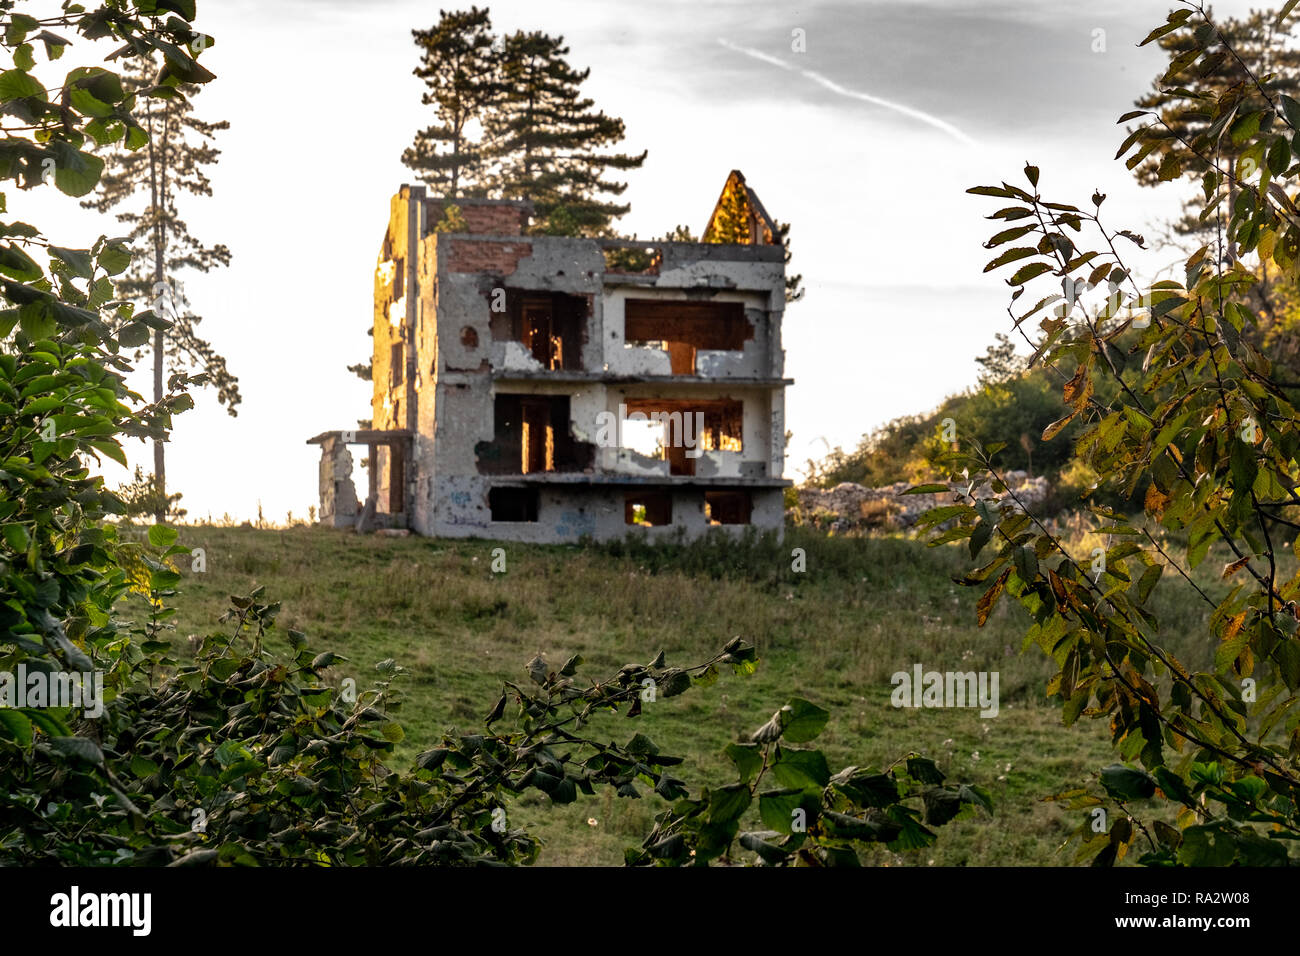 A ruined house in the hills near Sarajevo, Bosnia and Herzegovina Stock Photo